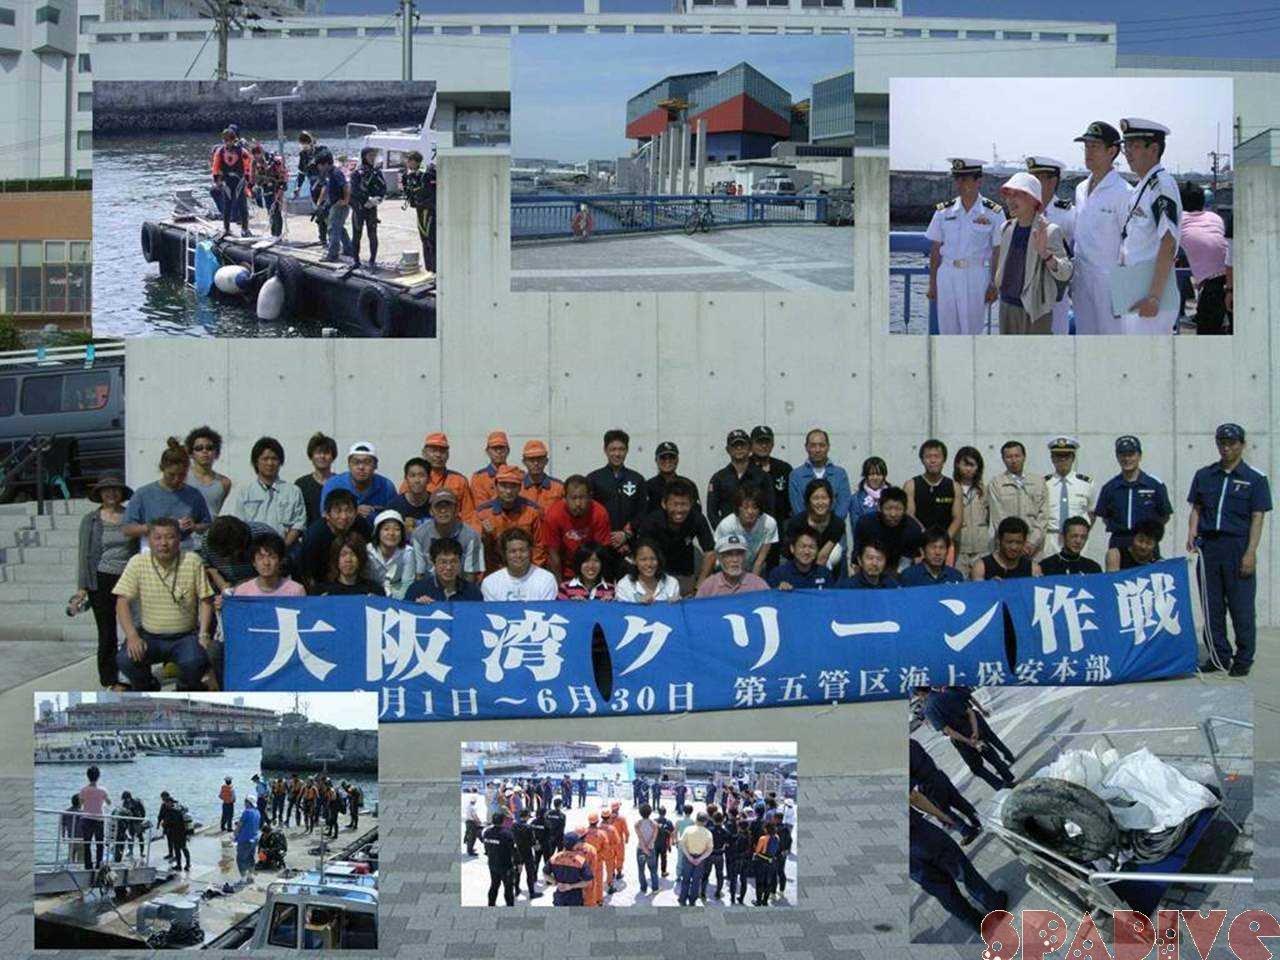 大阪湾クリーン作戦|6/5/2007大阪港海遊館前